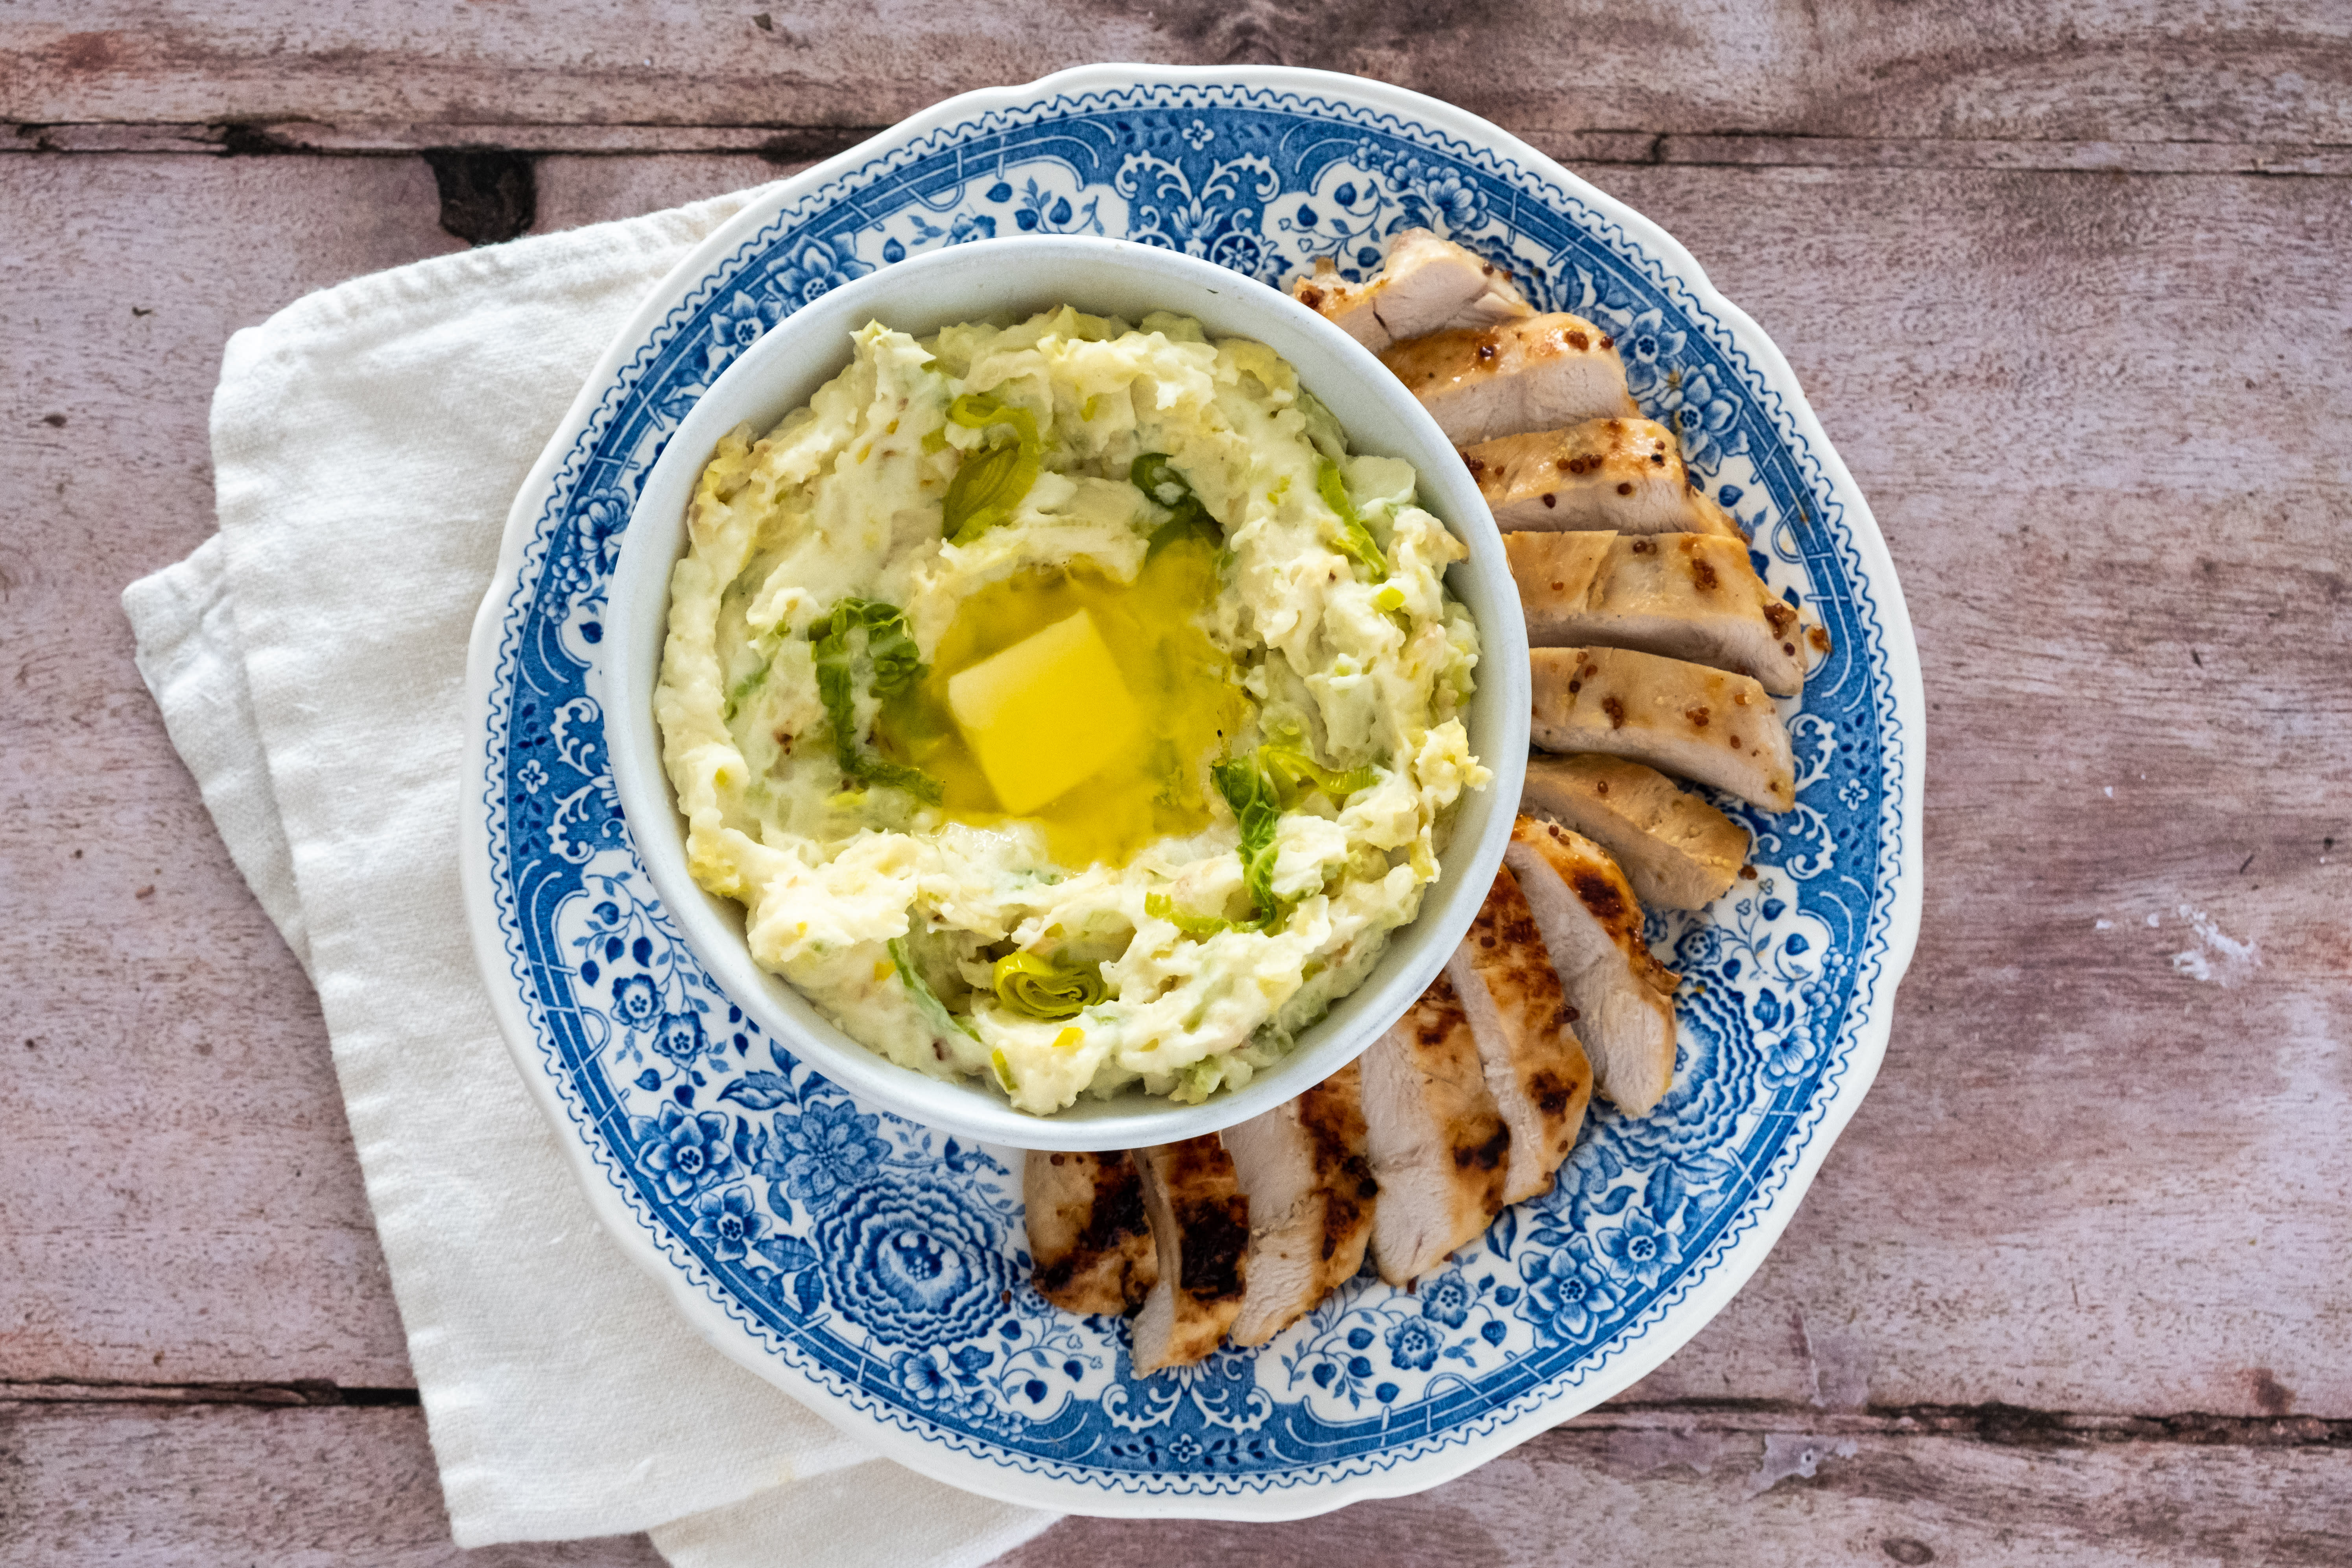 Irish Honey and Mustard Chicken with Colcannon Mashed Potato